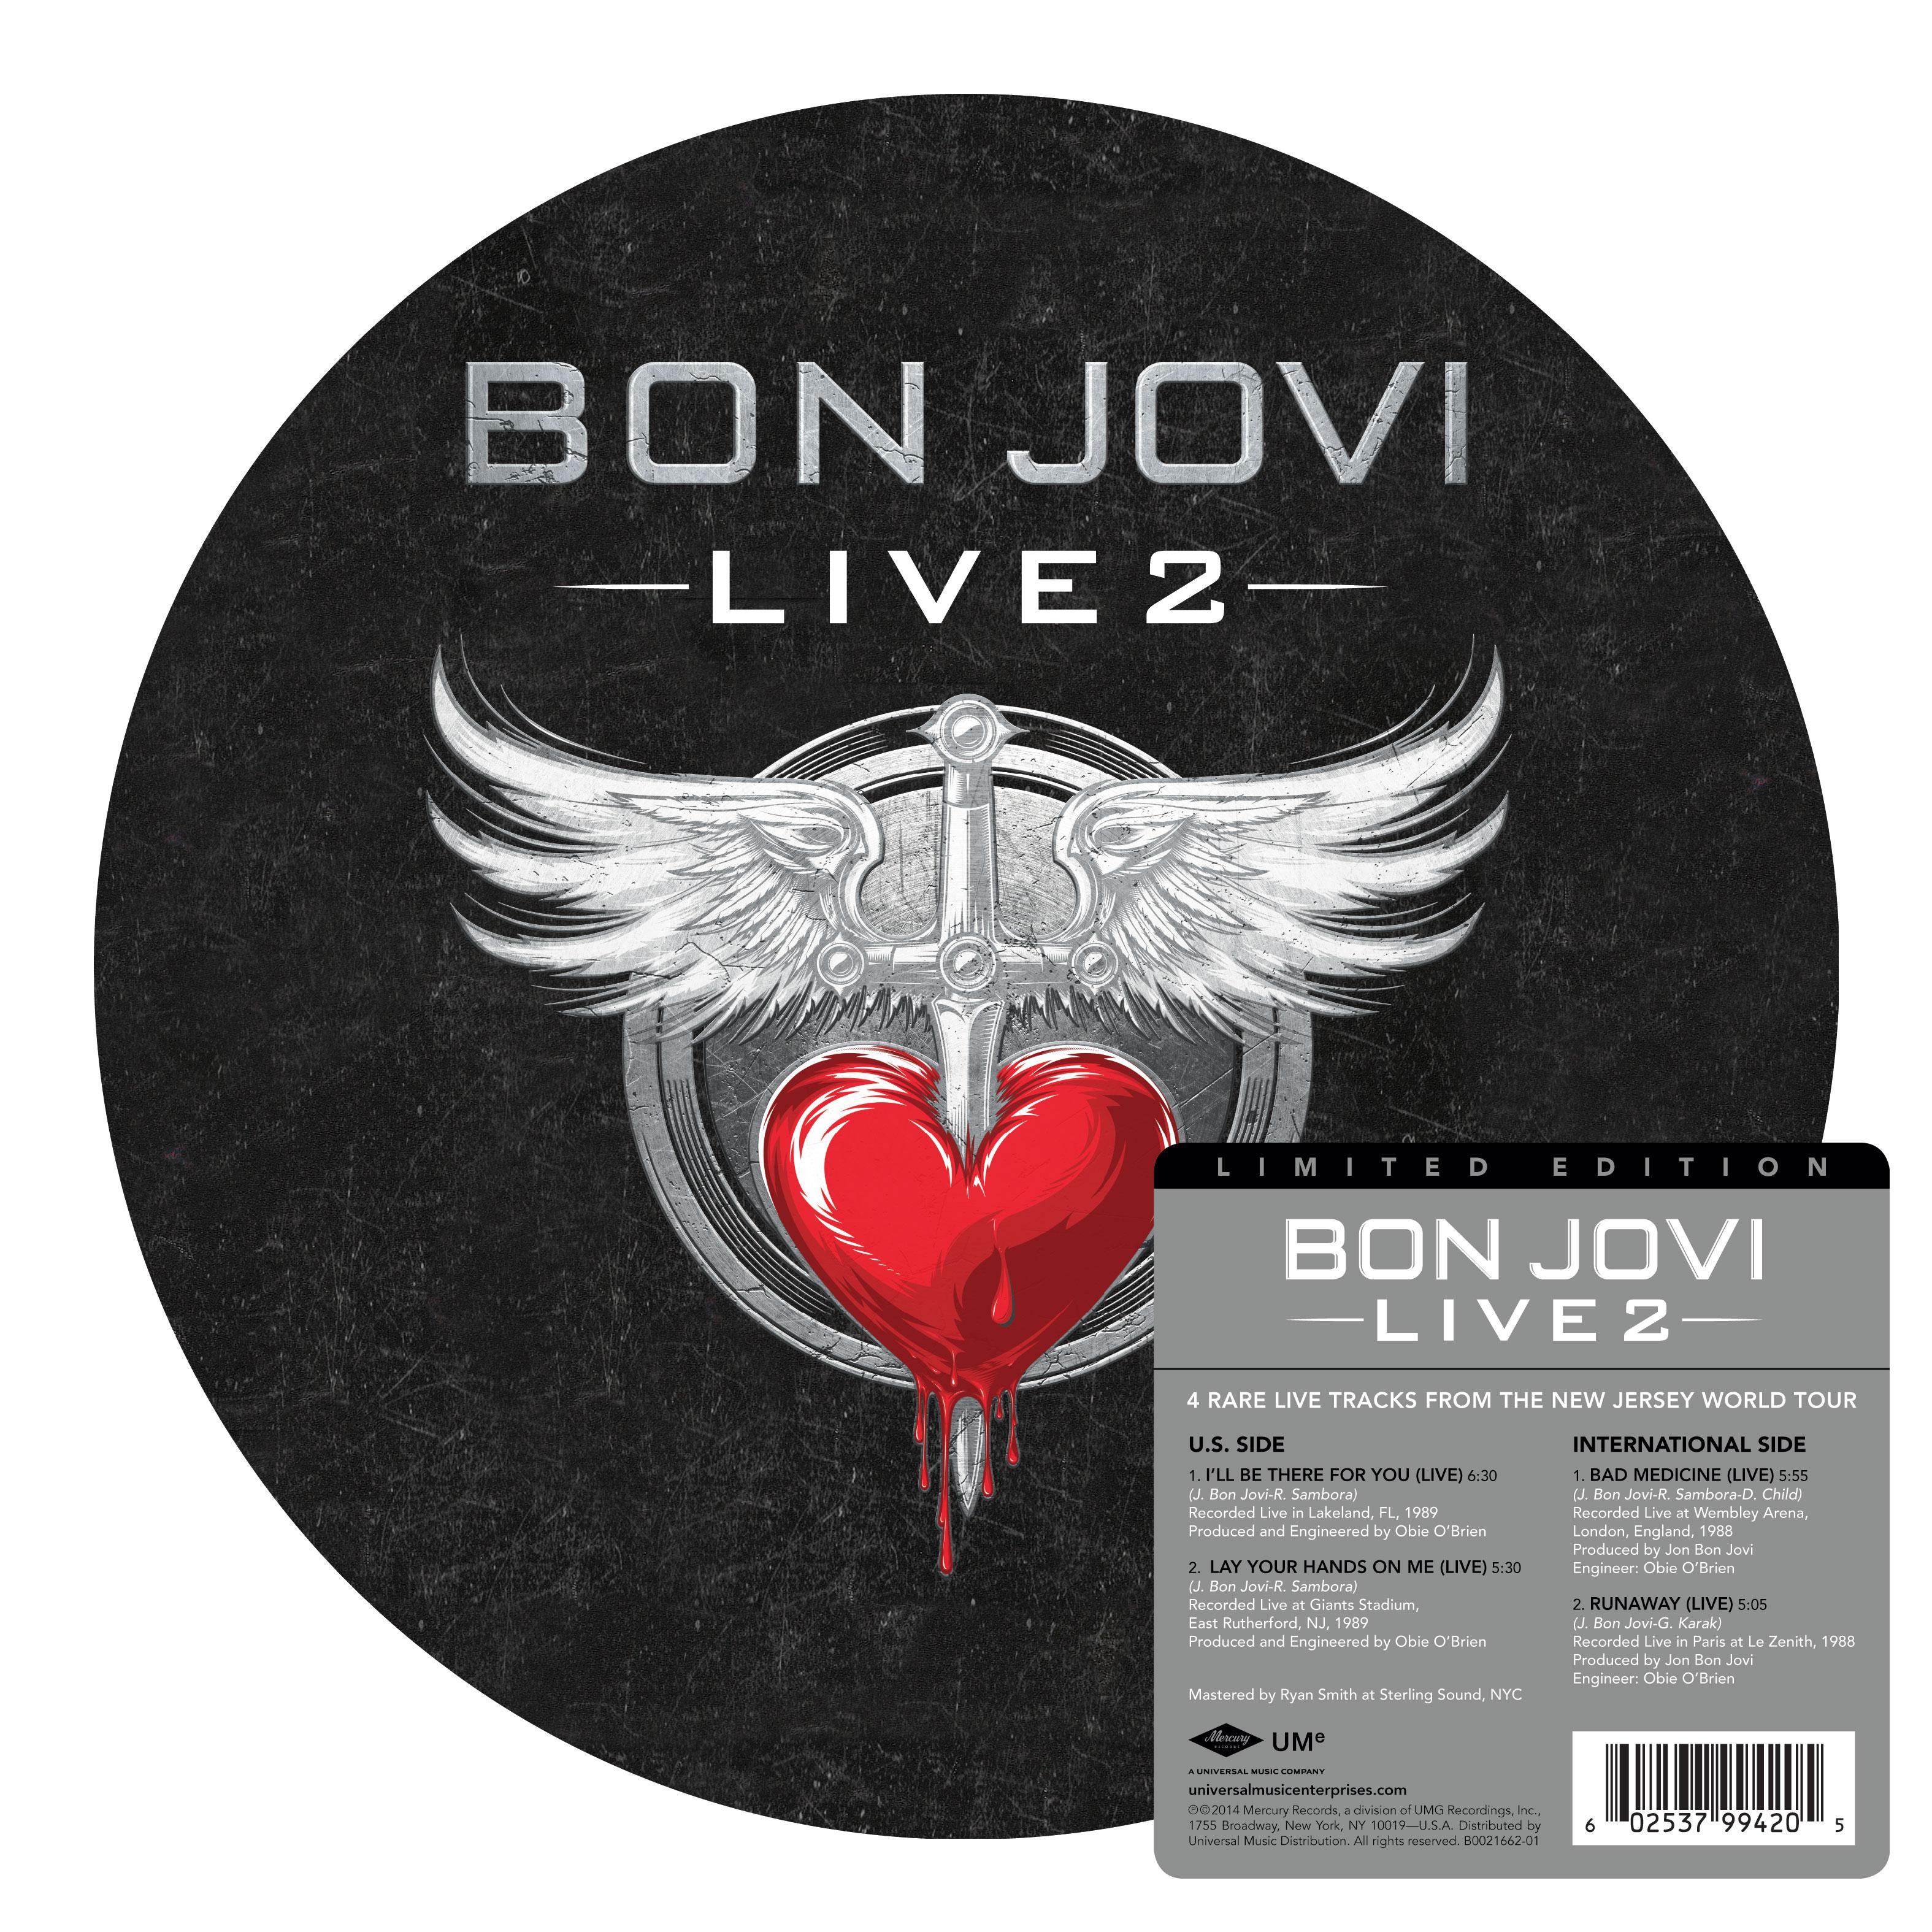 Bon Jovi Record Store Day